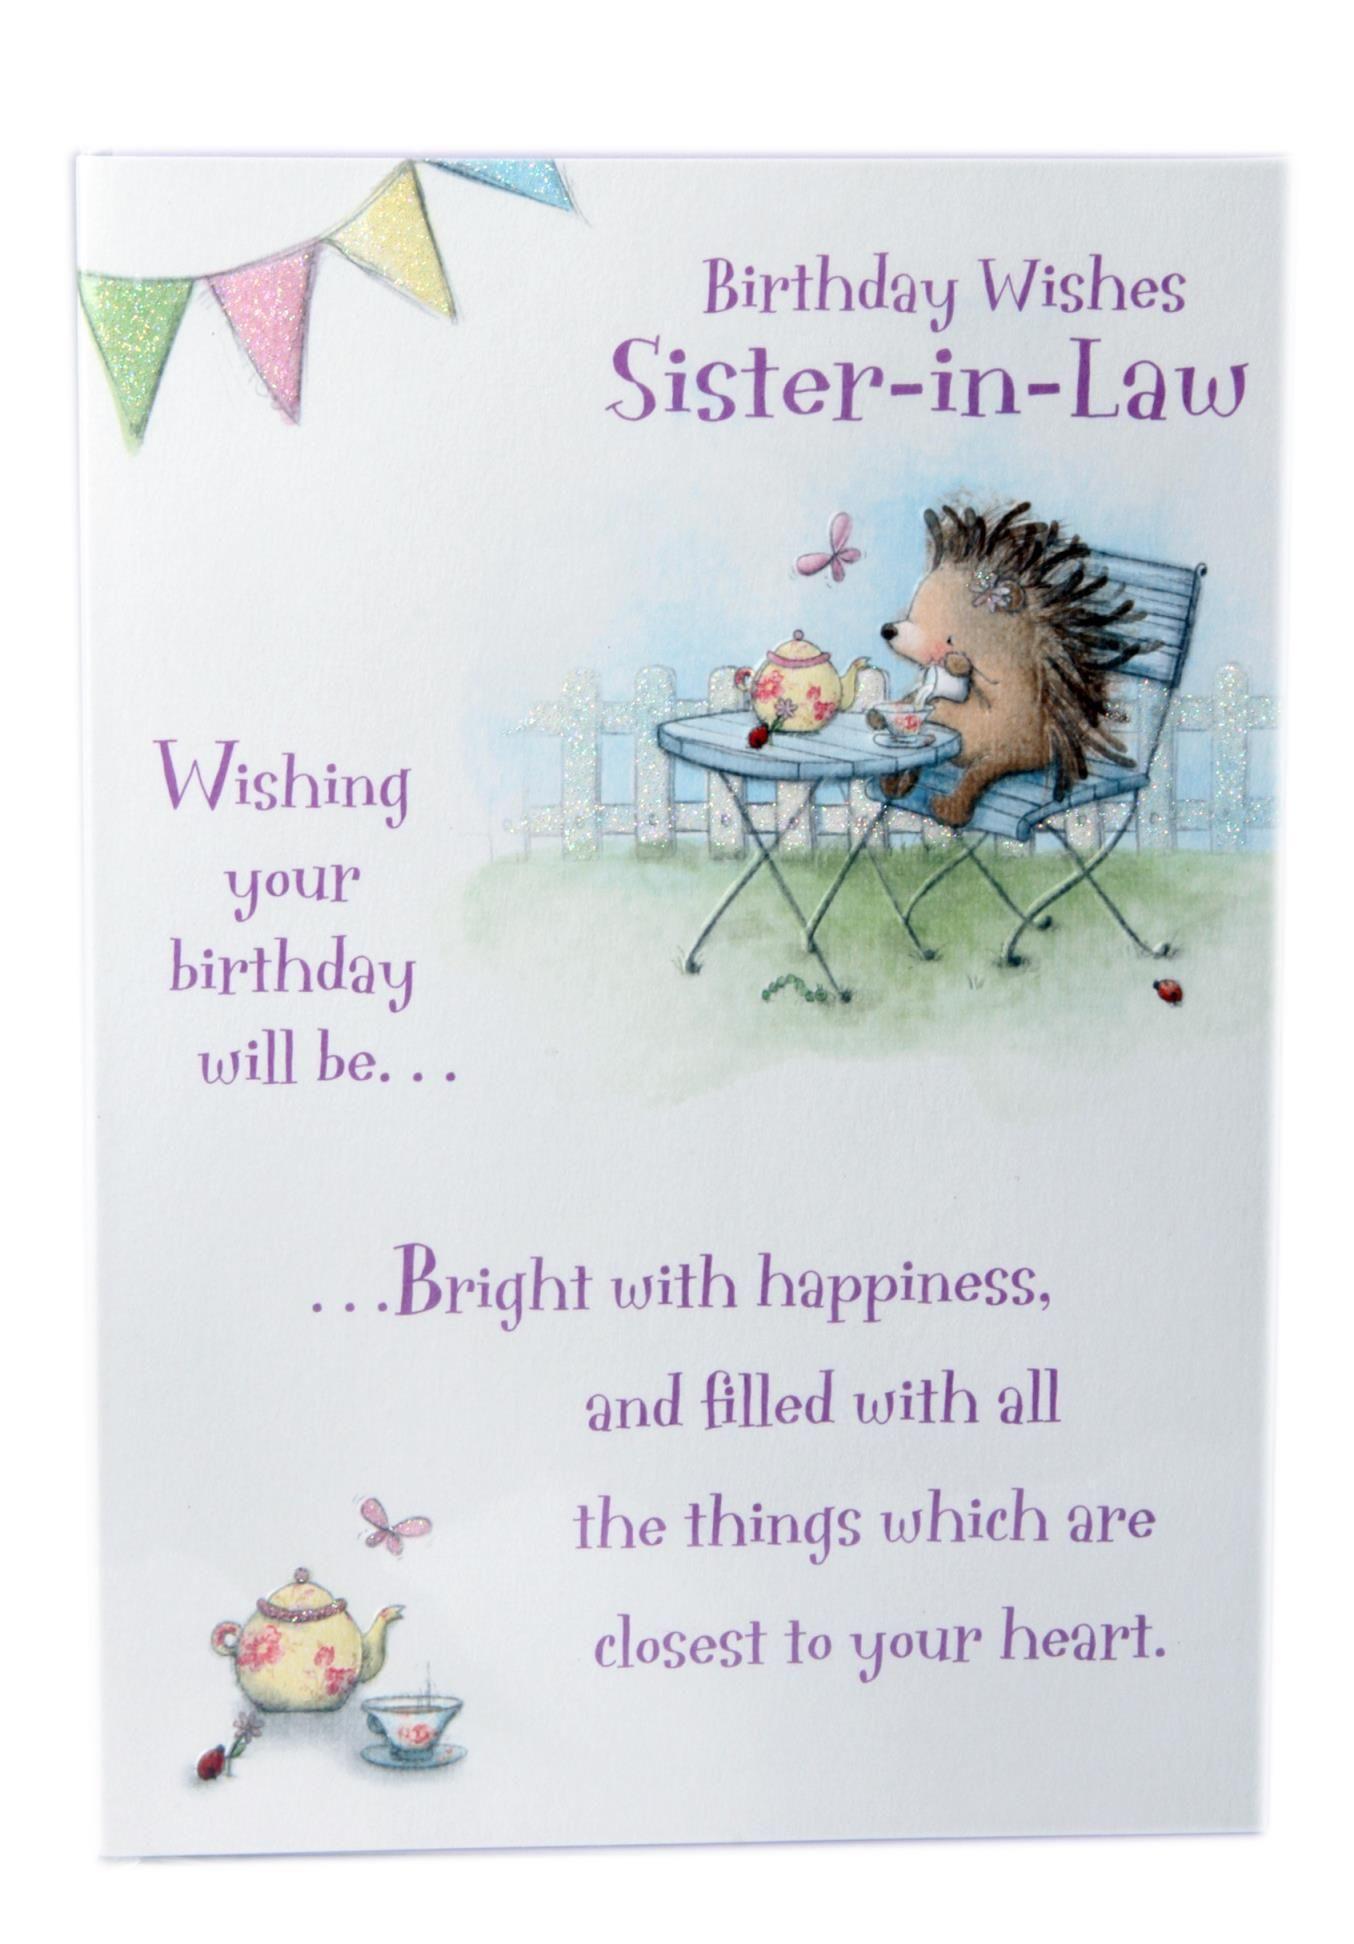 Happy Birthday Sister In Law Meme